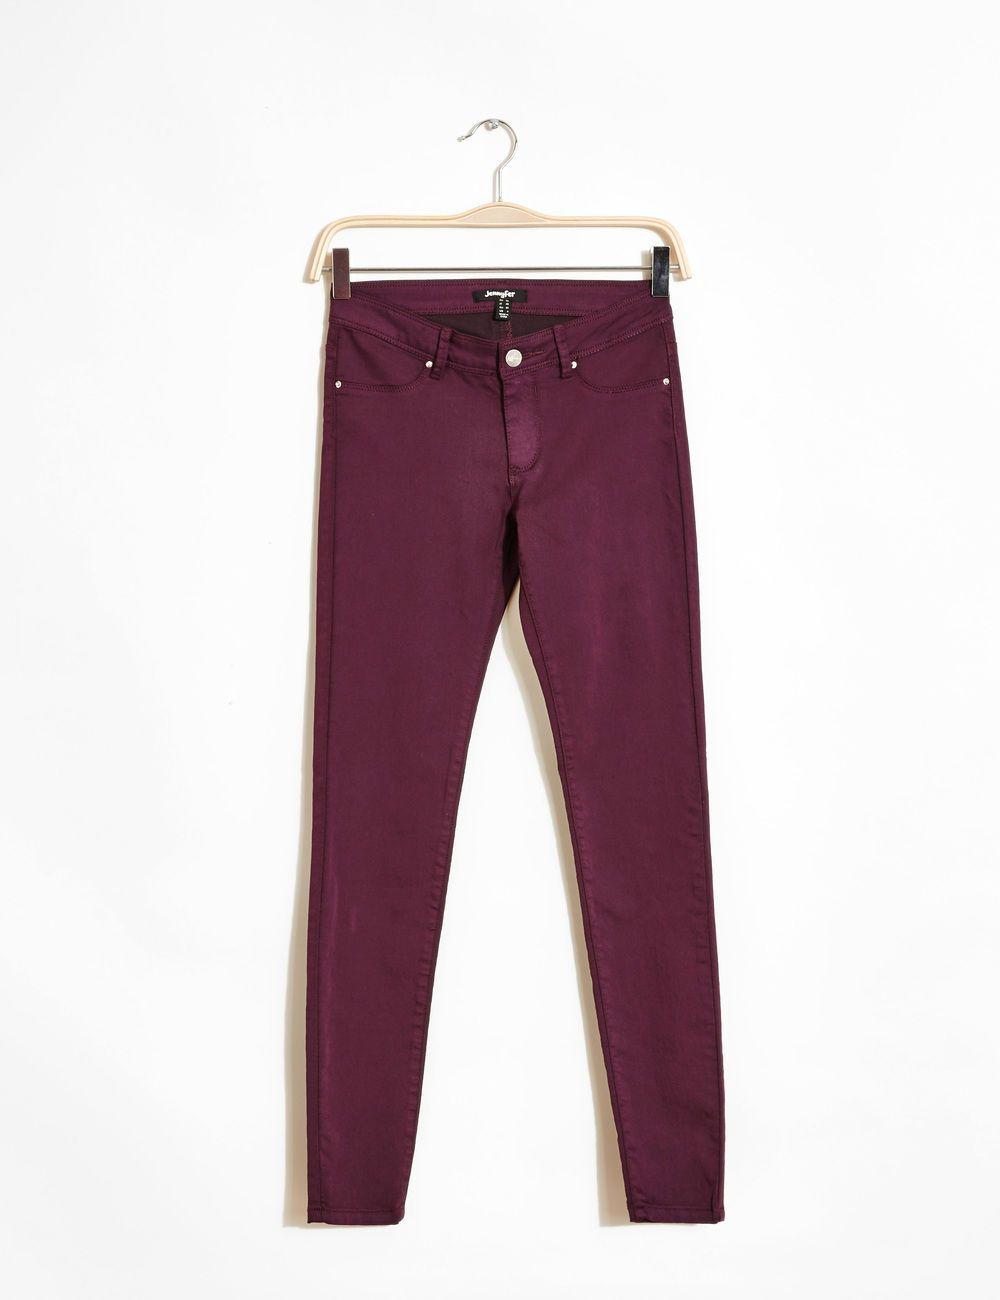 wholesale outlet free delivery shoes for cheap Pantalon jegging prune woman • Jennyfer | Wardrobe ...